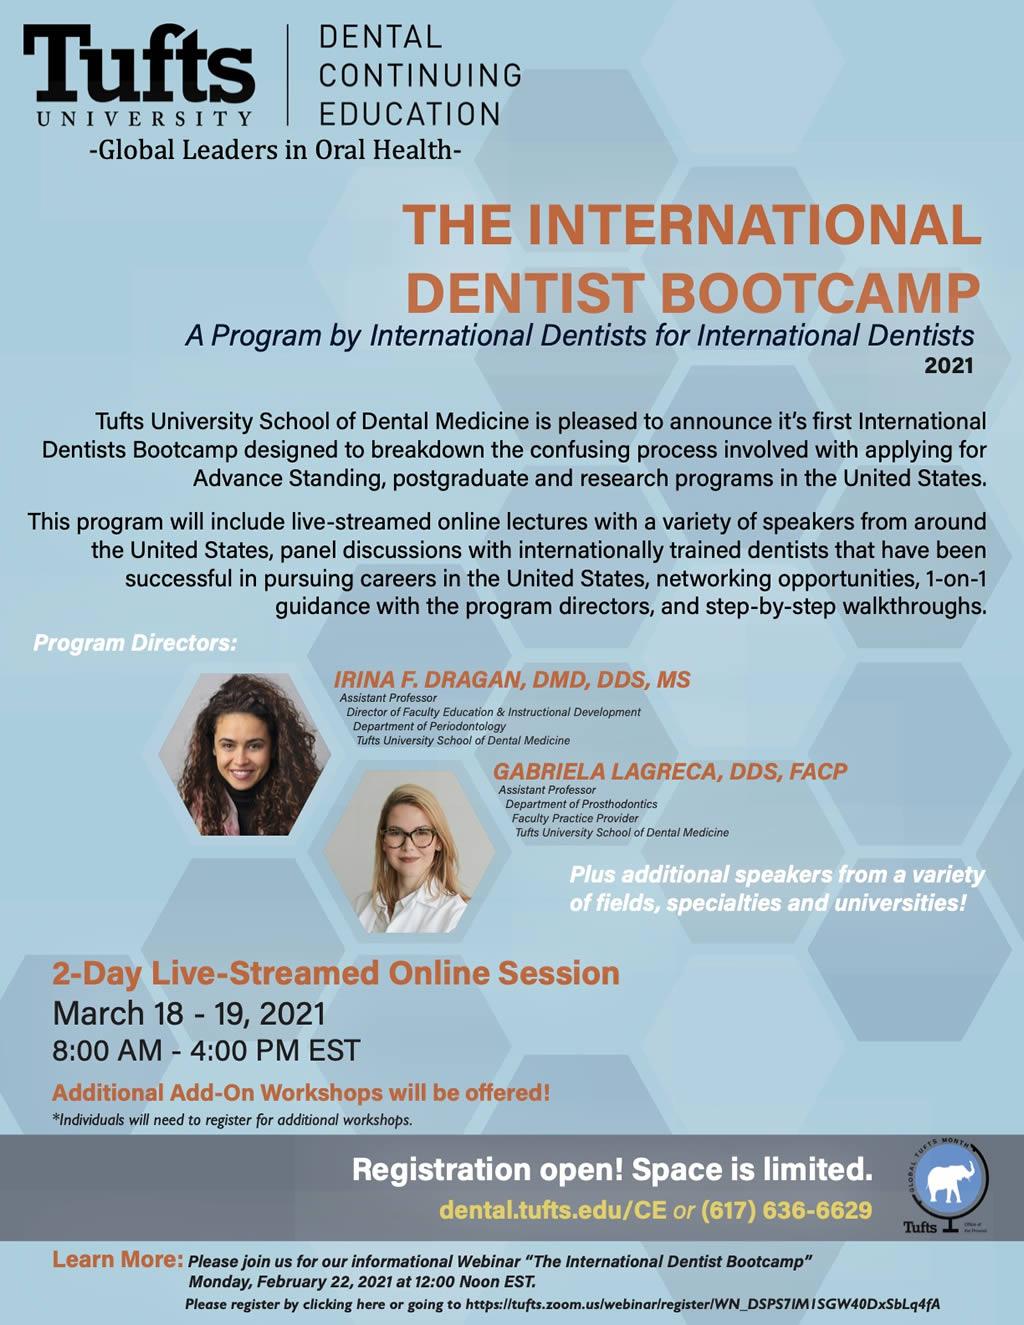 The International Dentist Bootcamp